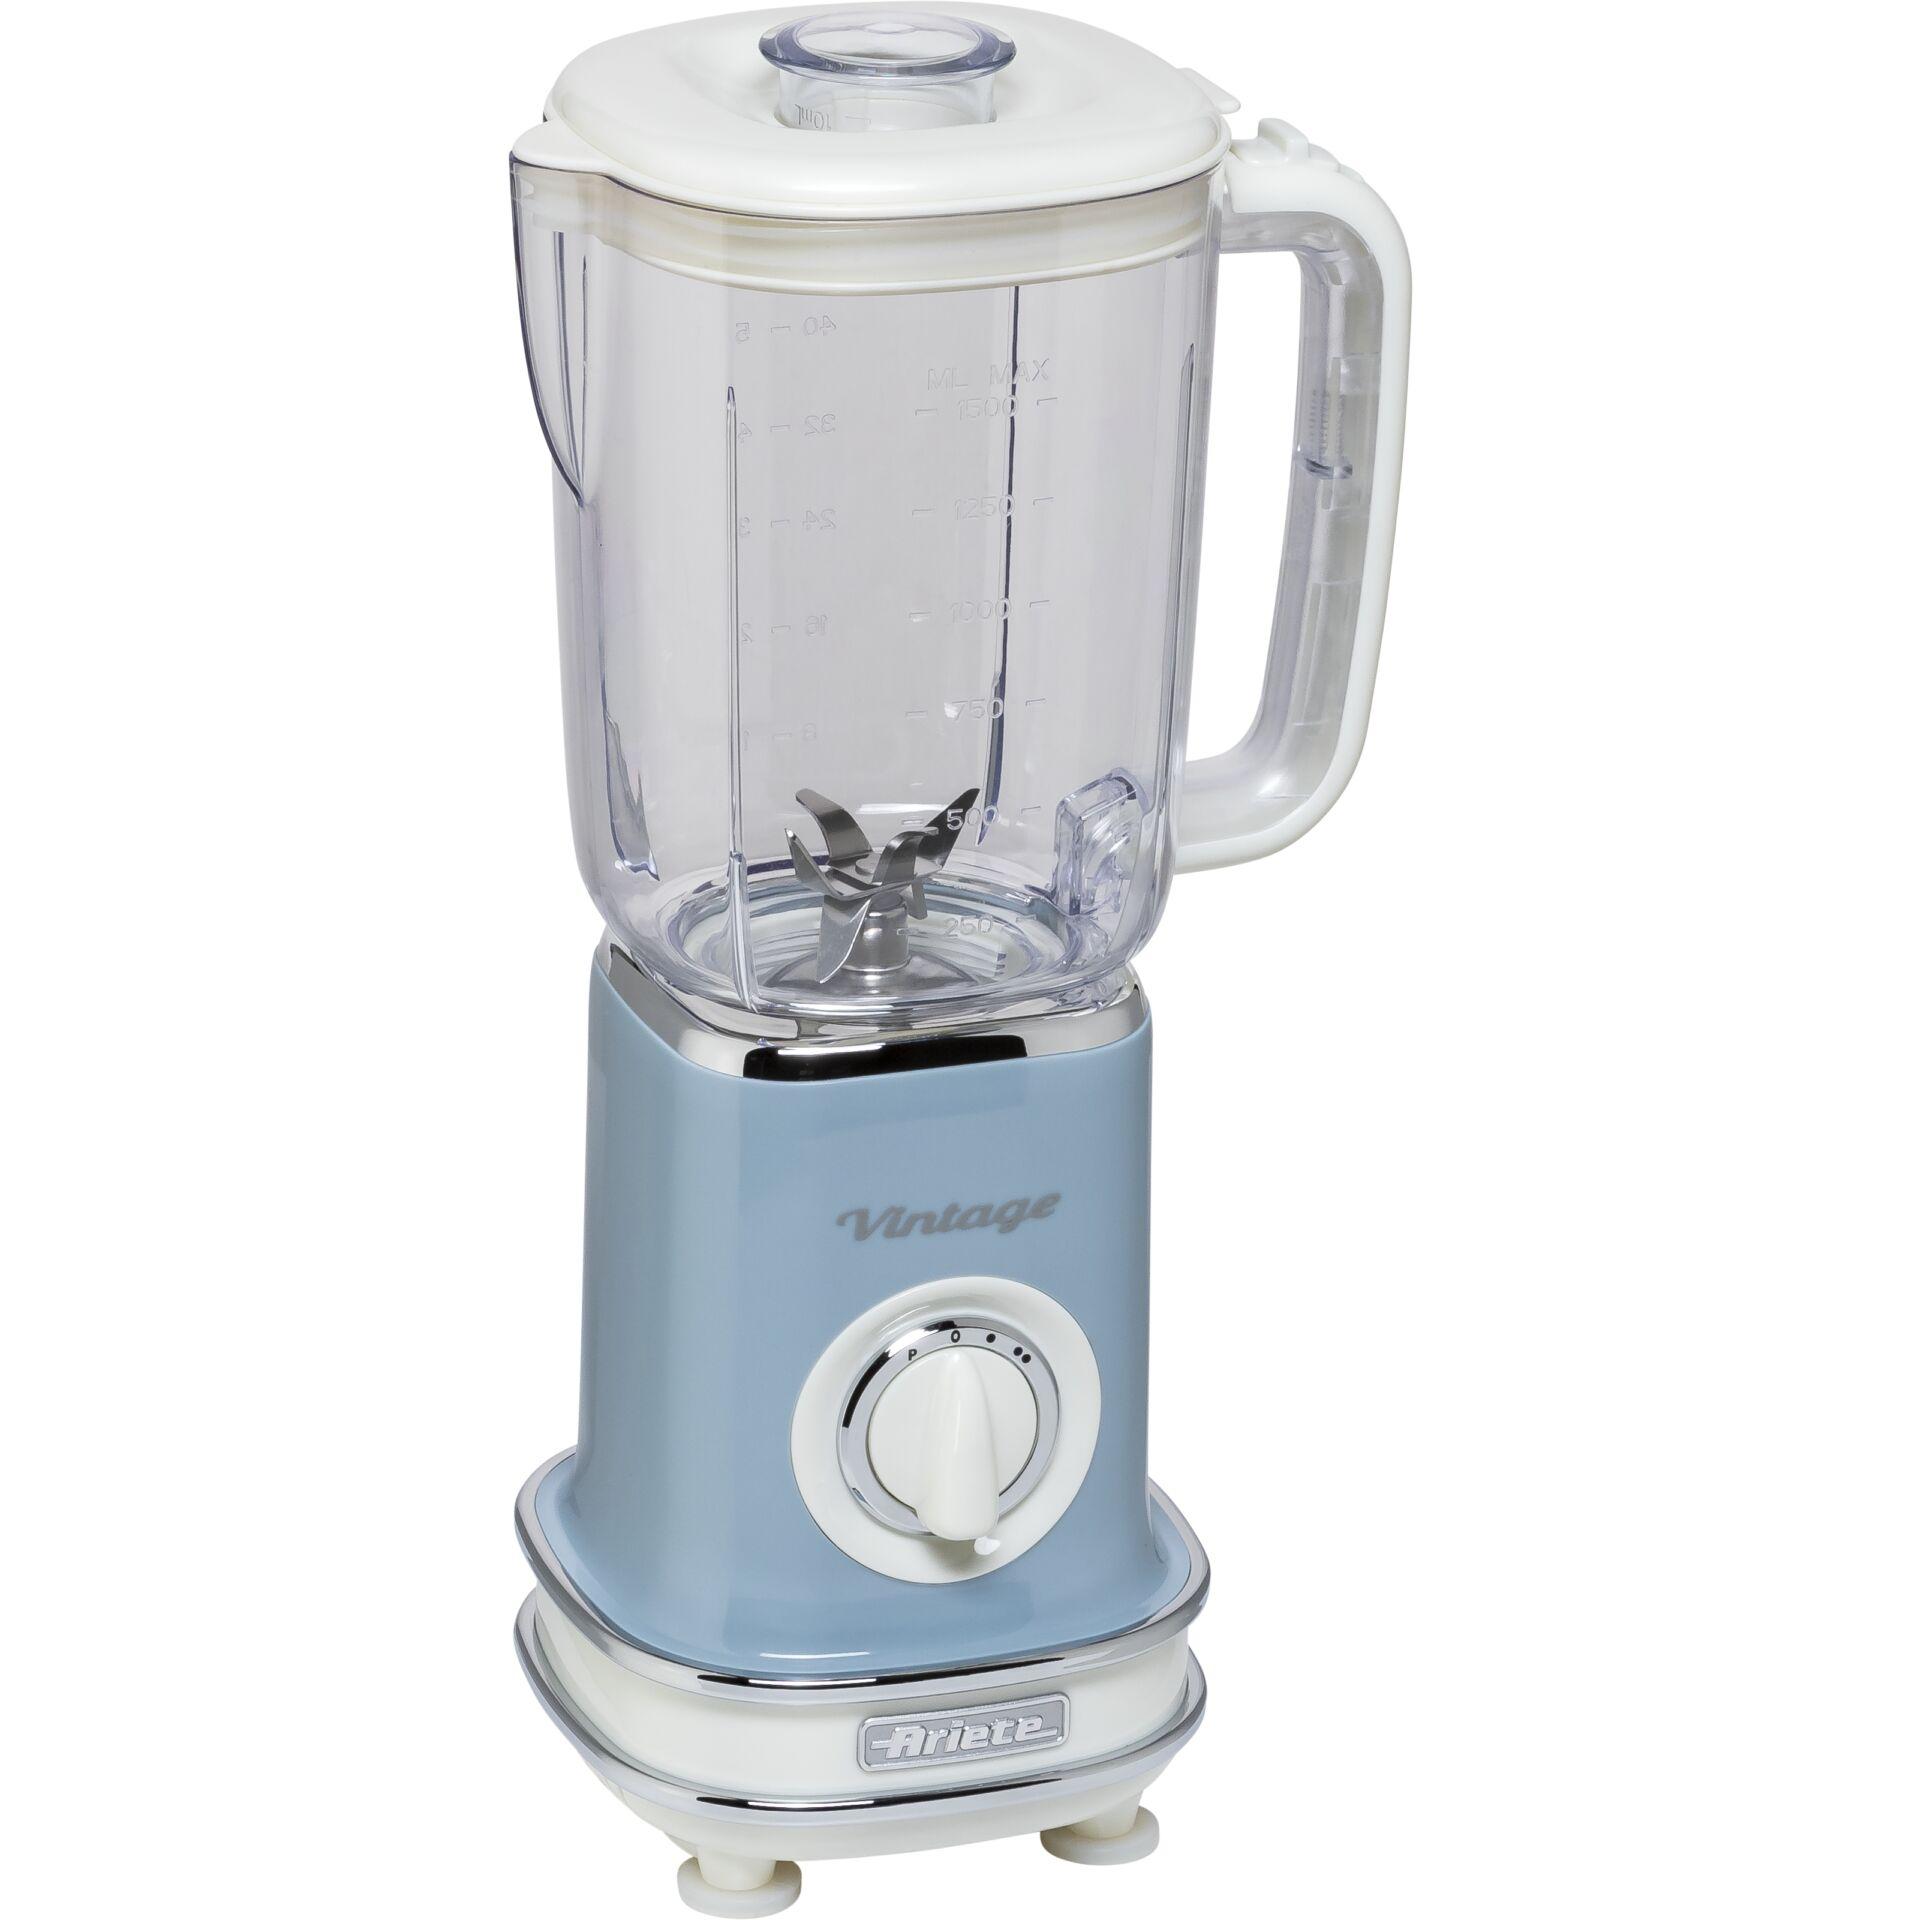 Ariete Vintage Mixer, blau